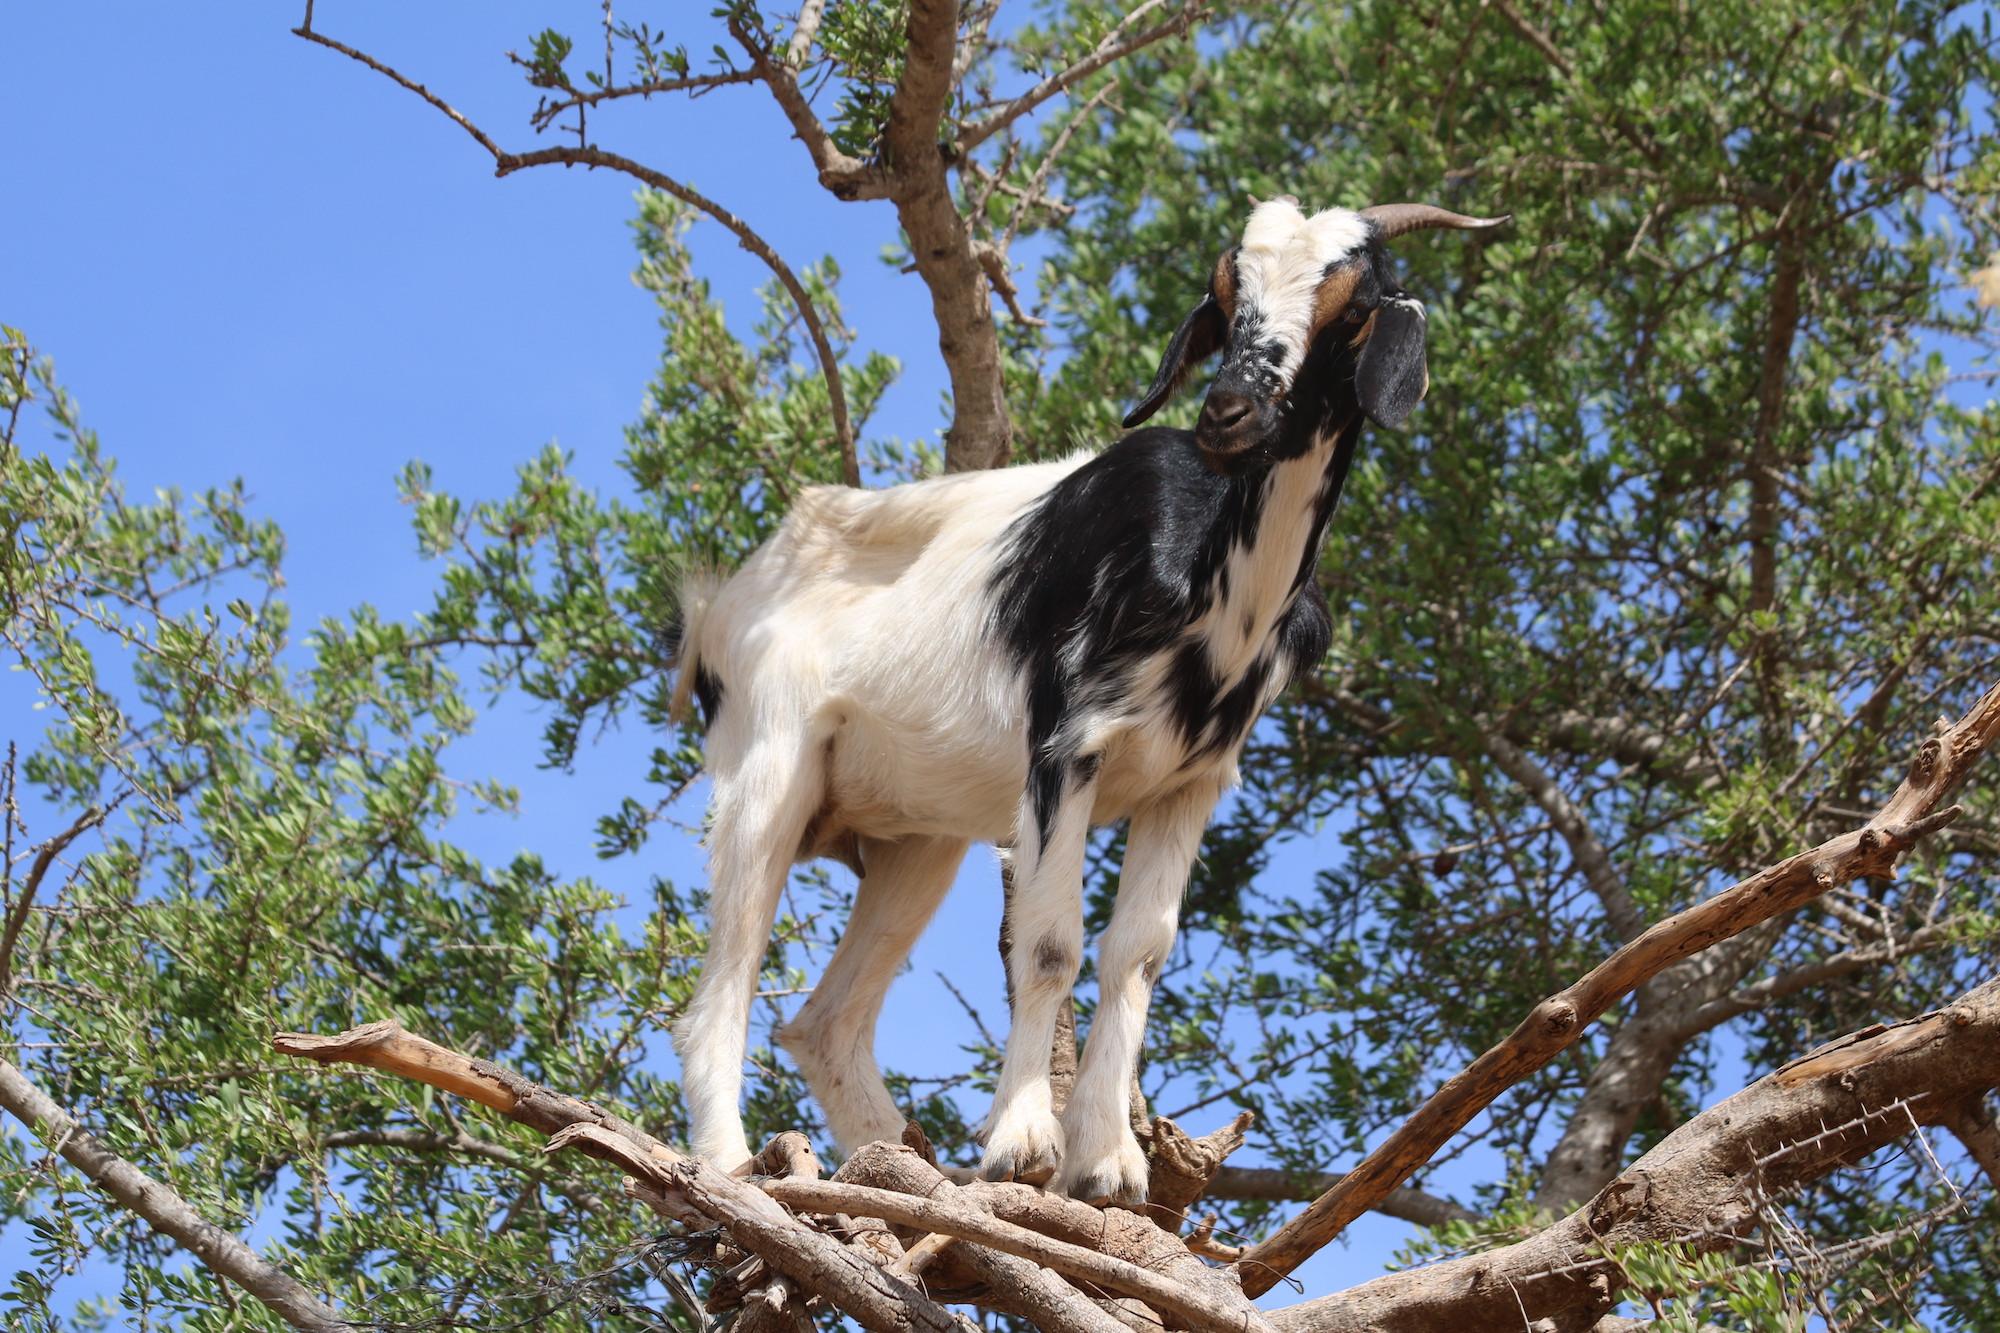 climbing-goat-8.JPG